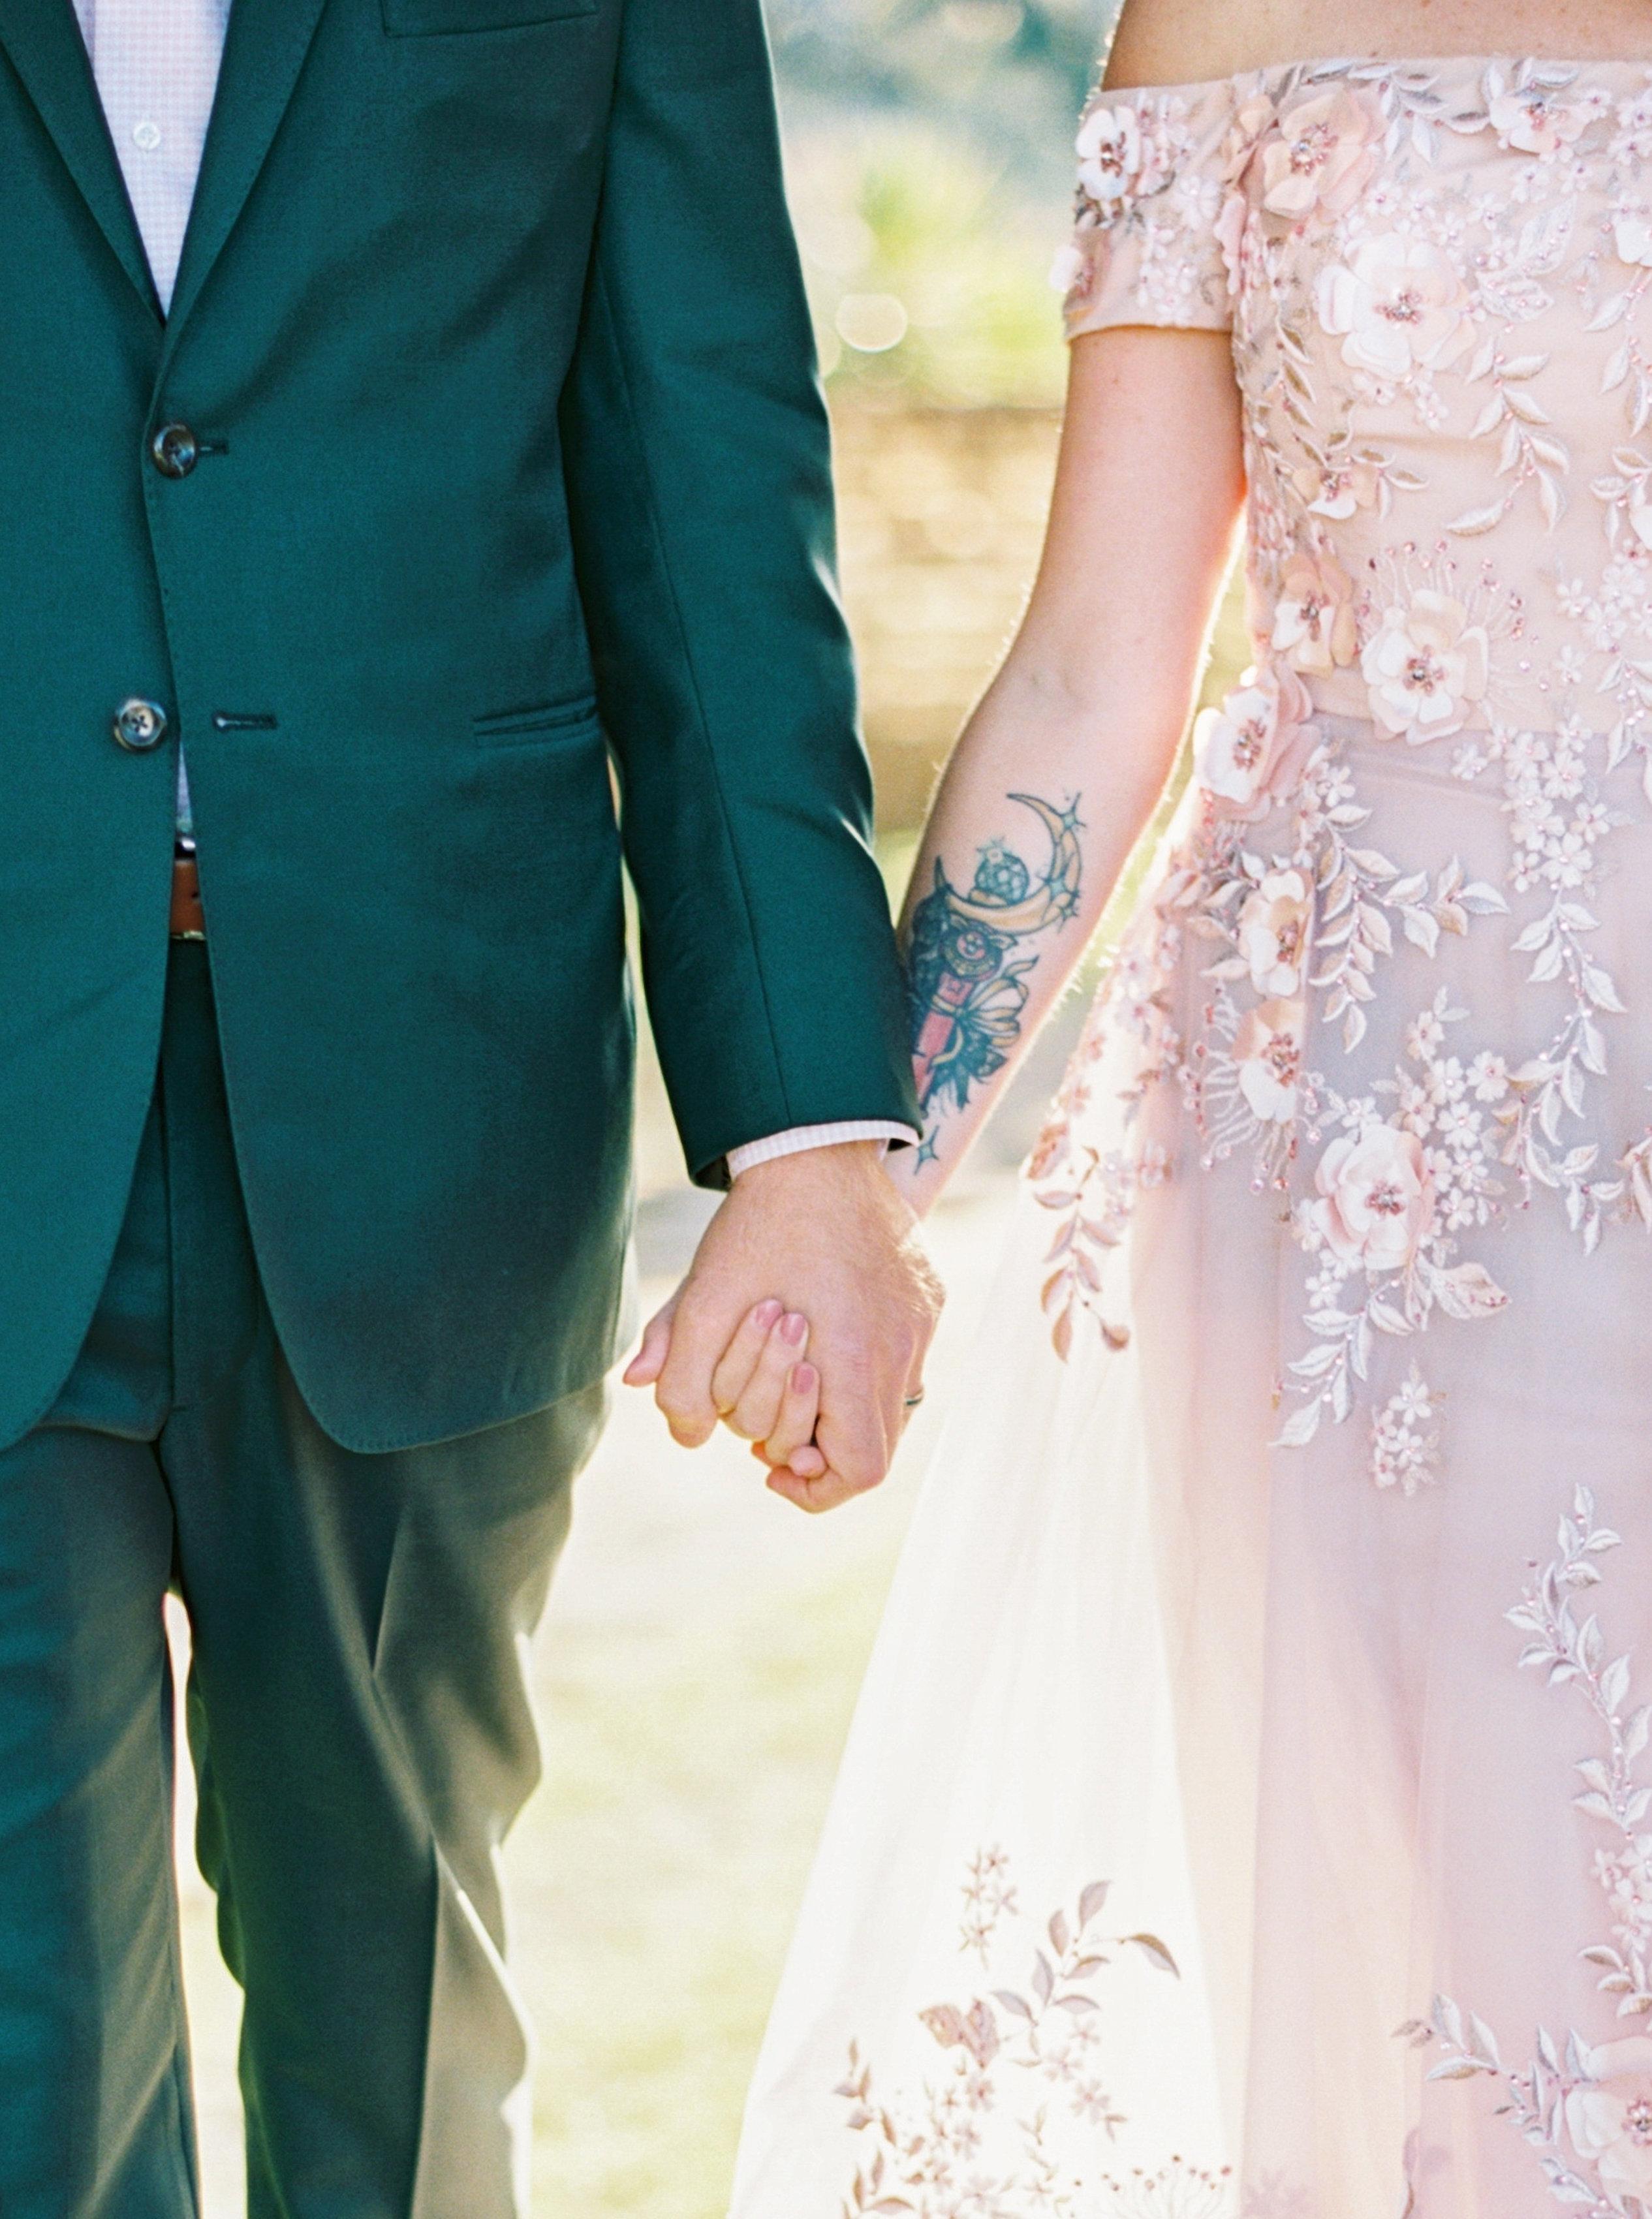 catherine john micro wedding couple hands perry vaile